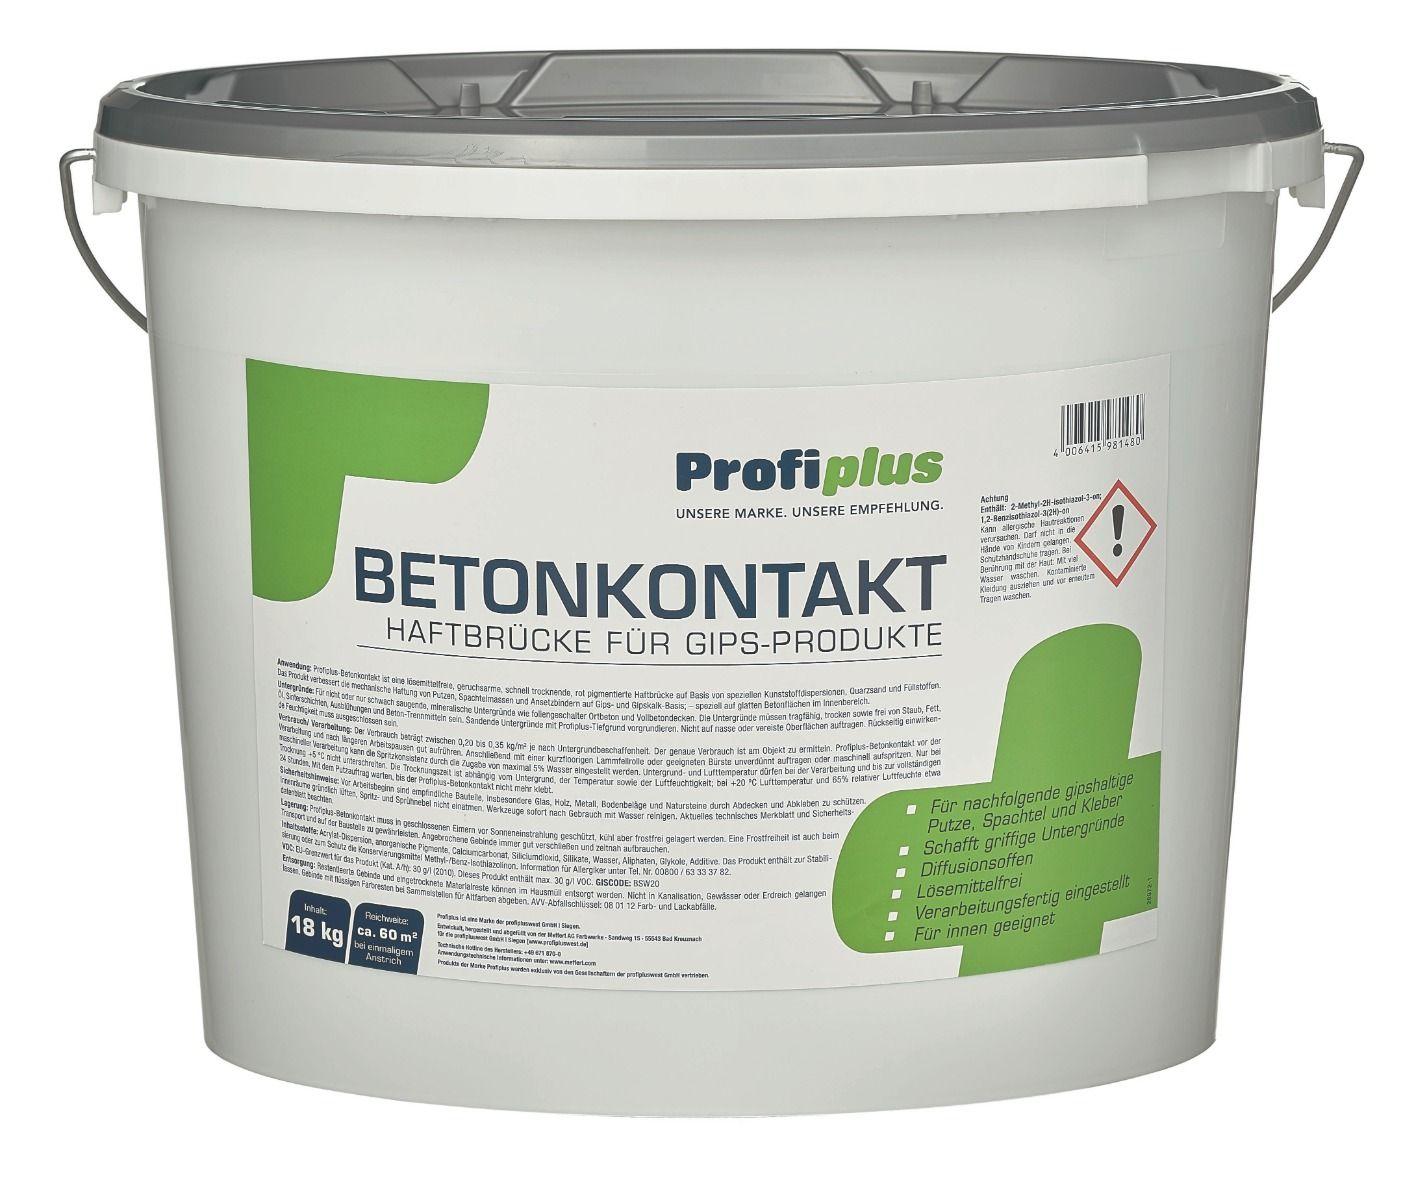 Profiplus  Betonkontakt 18 kg